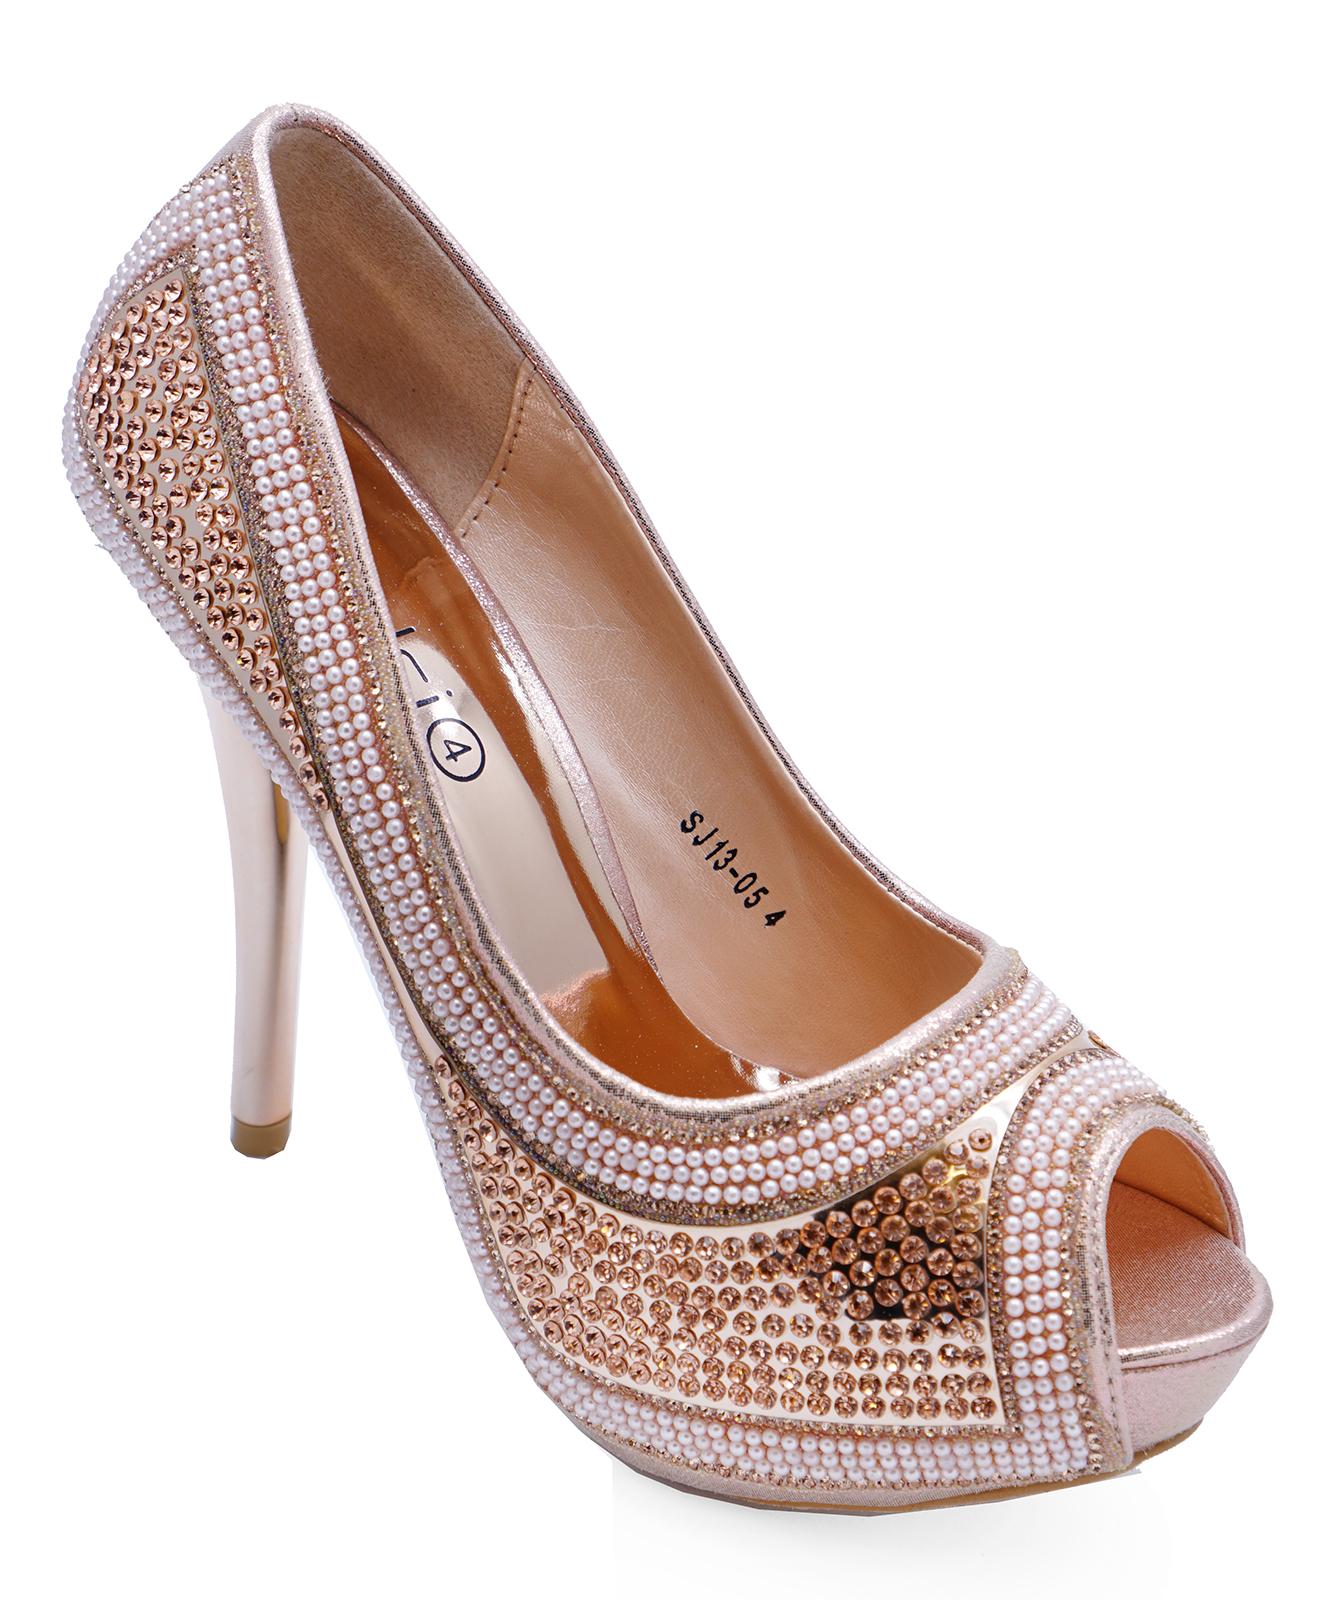 Sentinel LADIES ROSE GOLD DIAMANTE WEDDING BRIDESMAID PROM PEEP-TOE PARTY SHOES  UK 3-7 7a1af8c887